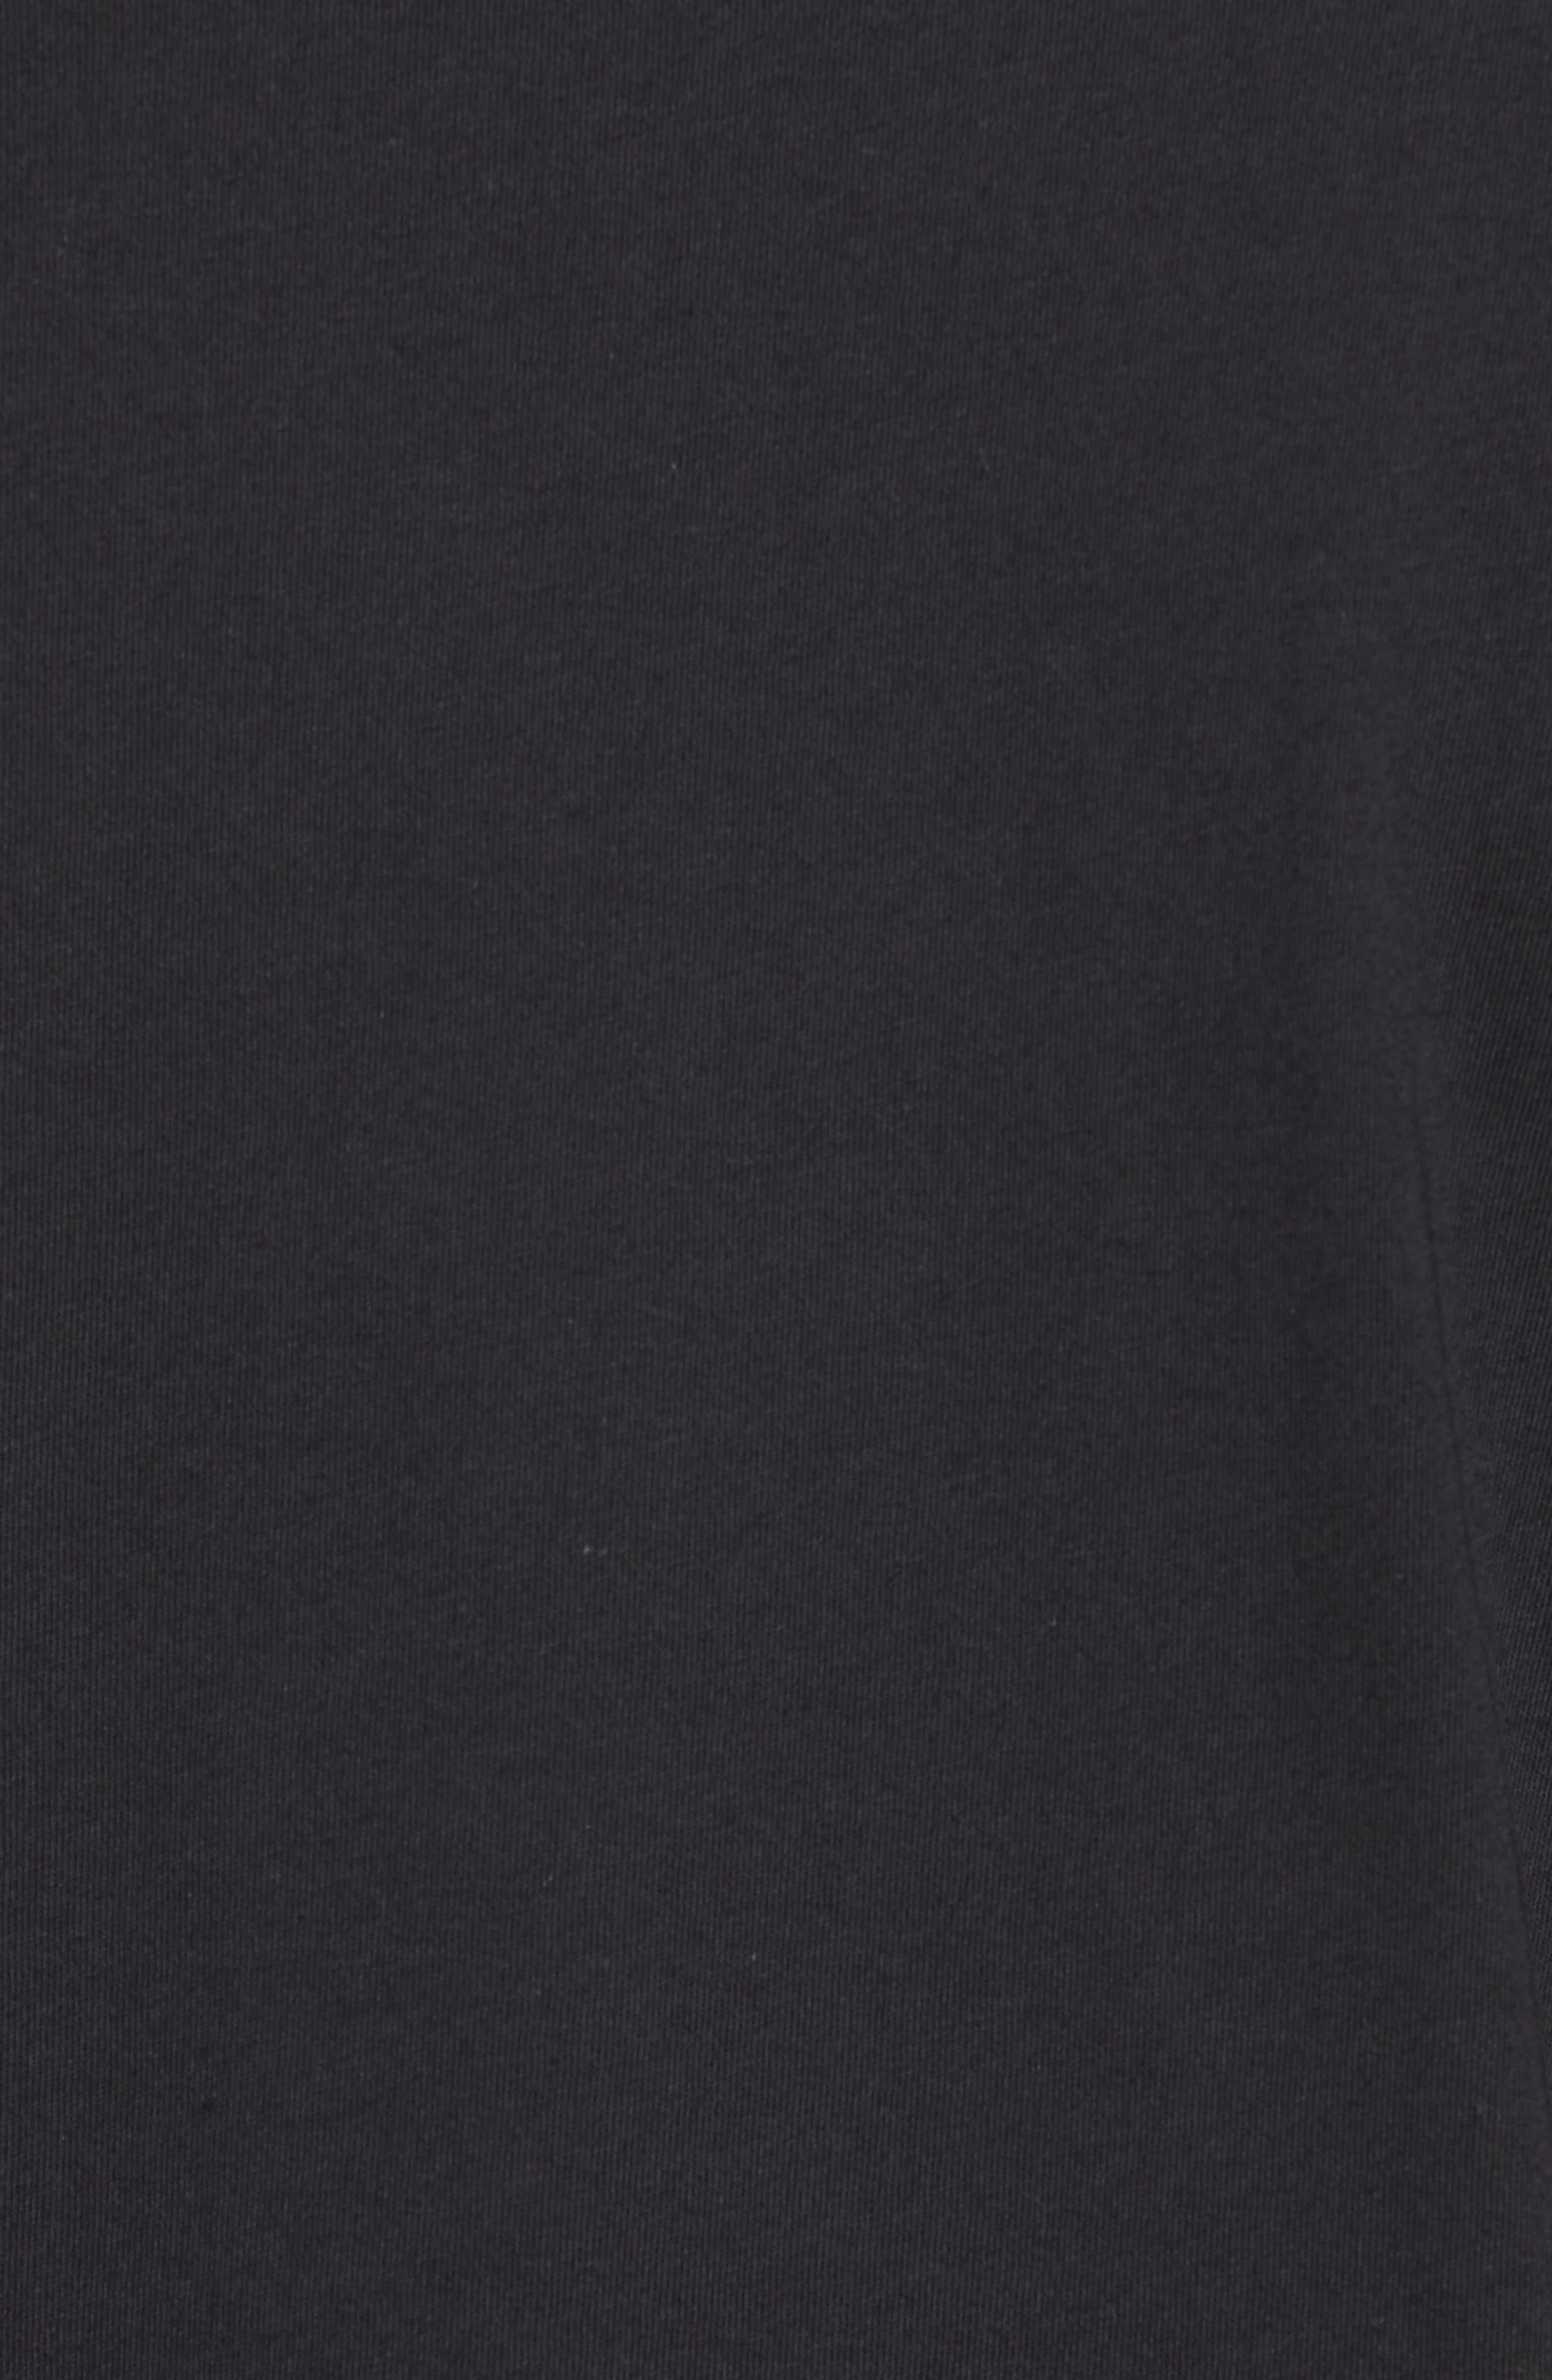 Iconic Jumpman Graphic T-Shirt,                             Alternate thumbnail 5, color,                             Black/ White